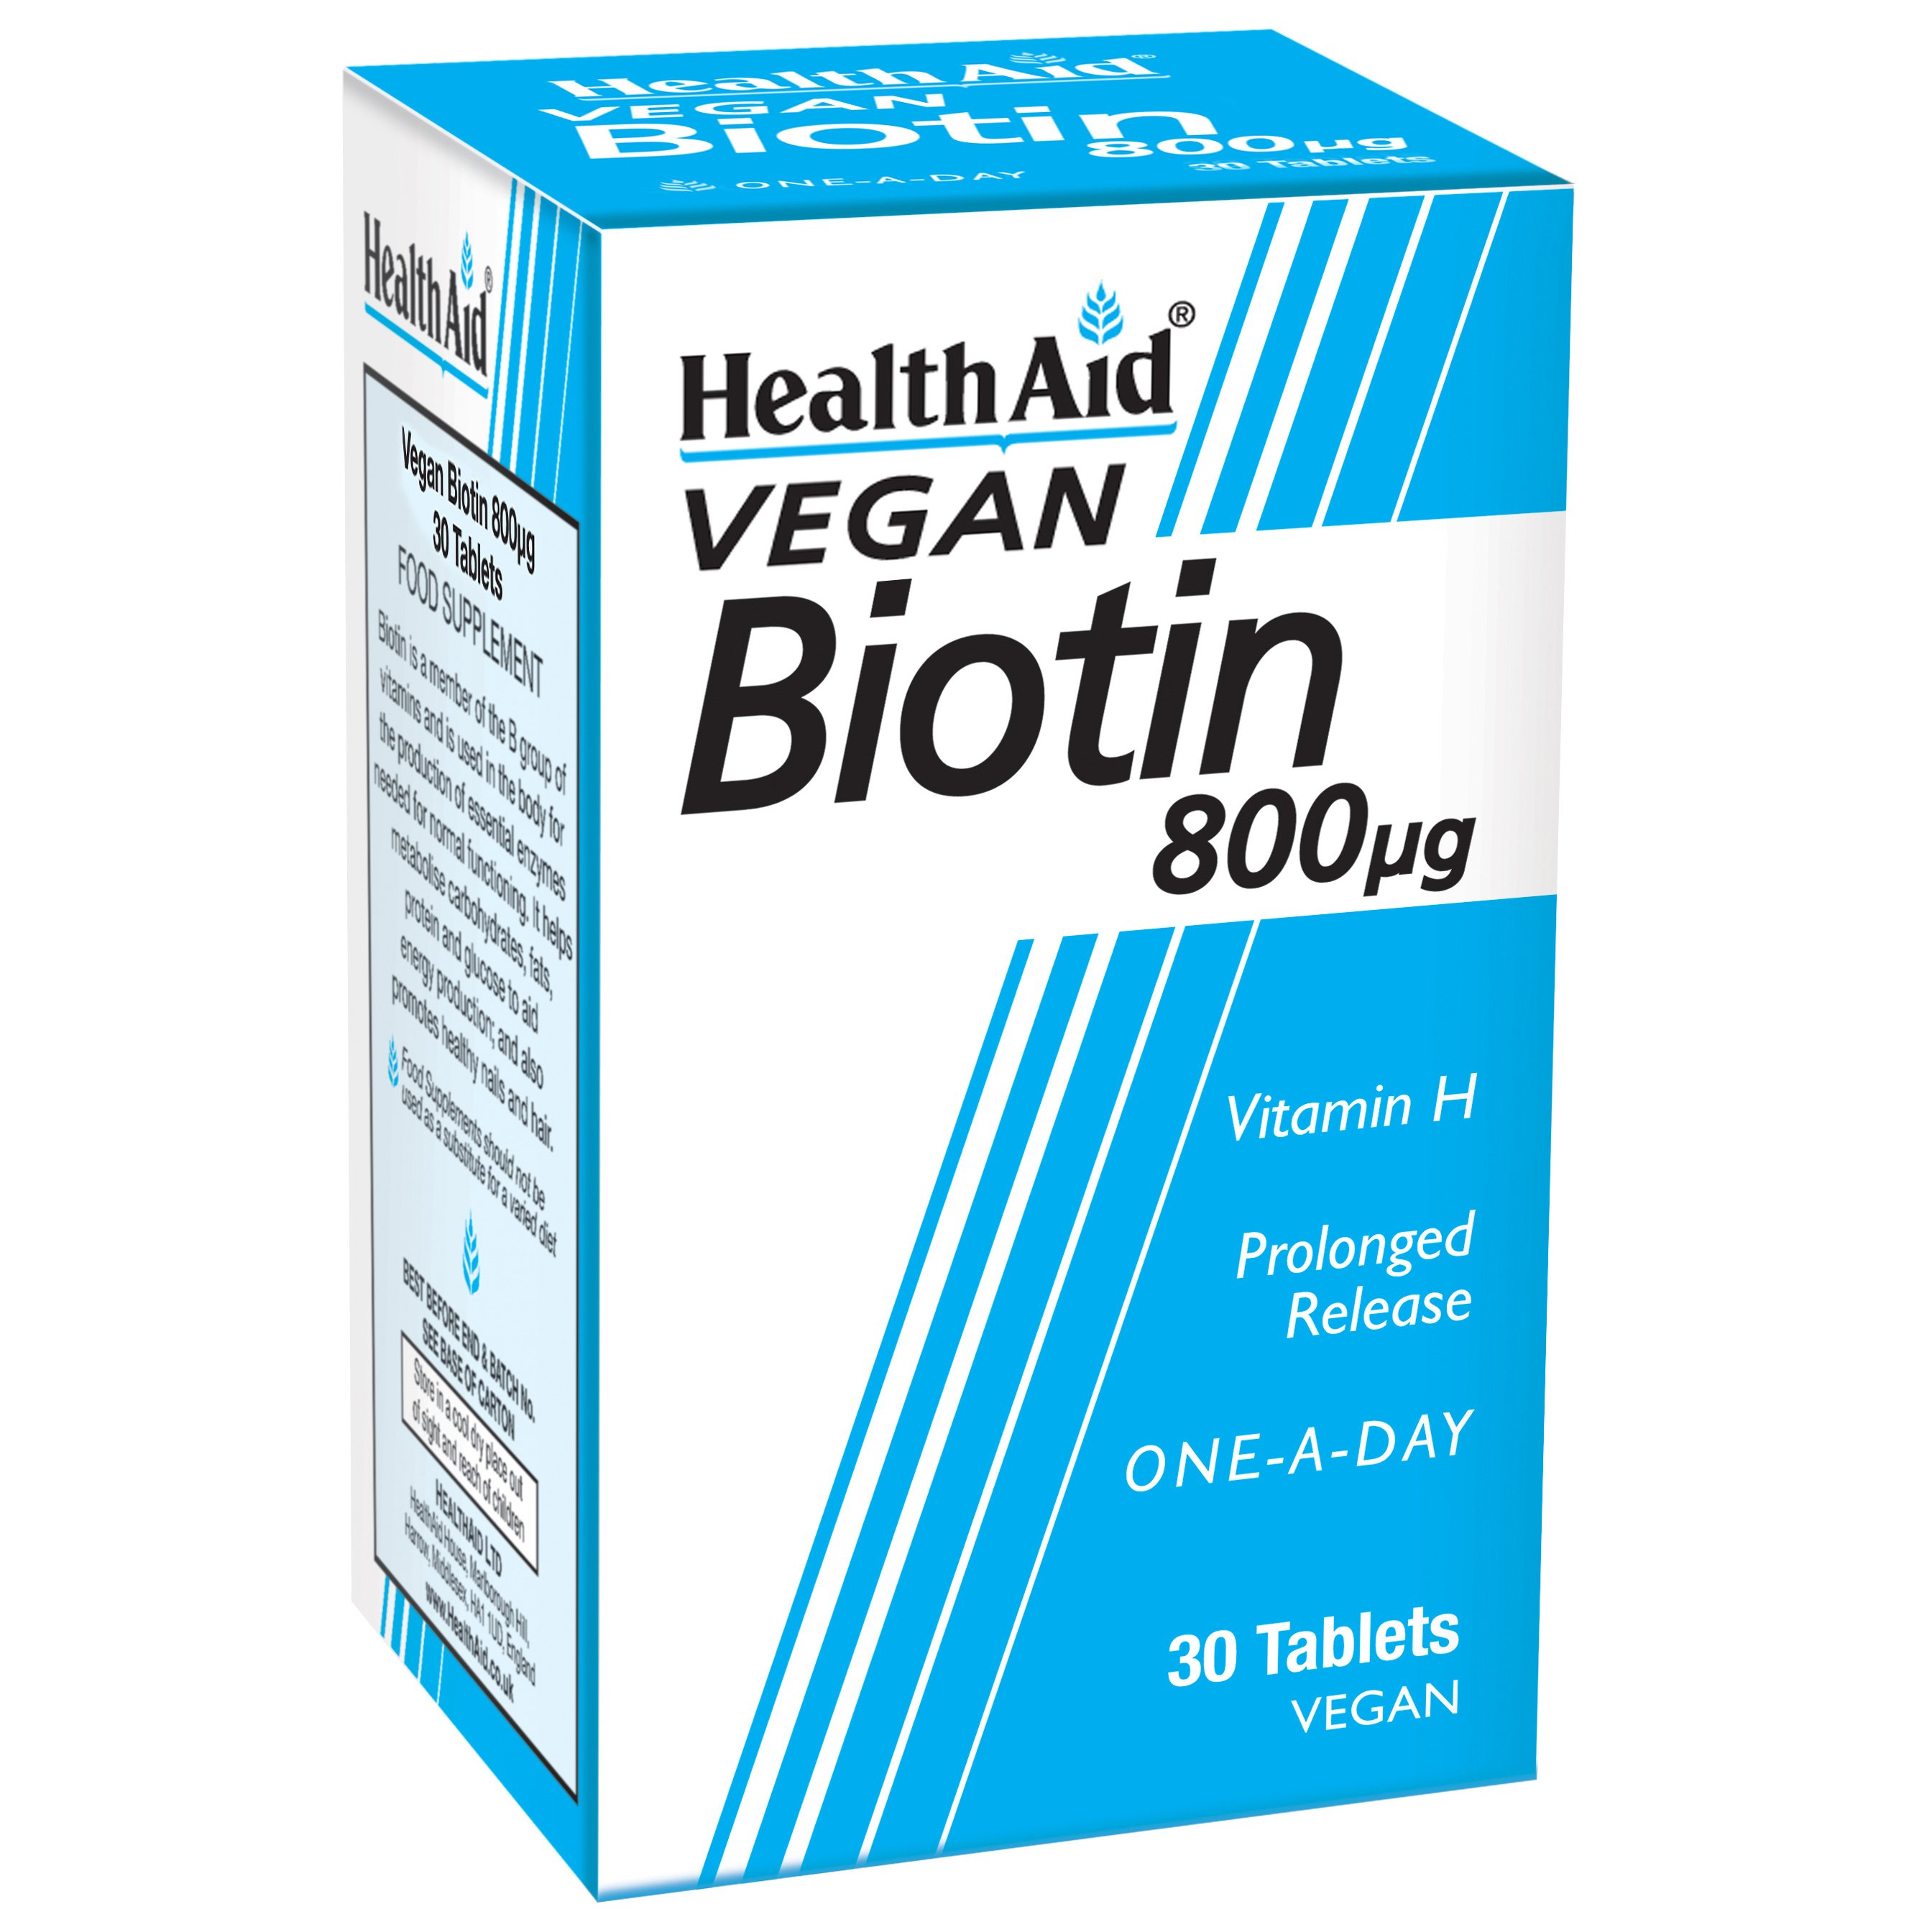 Health Aid Biotin (vitamin H) 800mg 30tabs,Συμπλήρωμα Διατροφής, Ενισχύει τα Μαλλιά, το Δέρμα και τα Νύχια, Βραδείας Αποδέσμευση